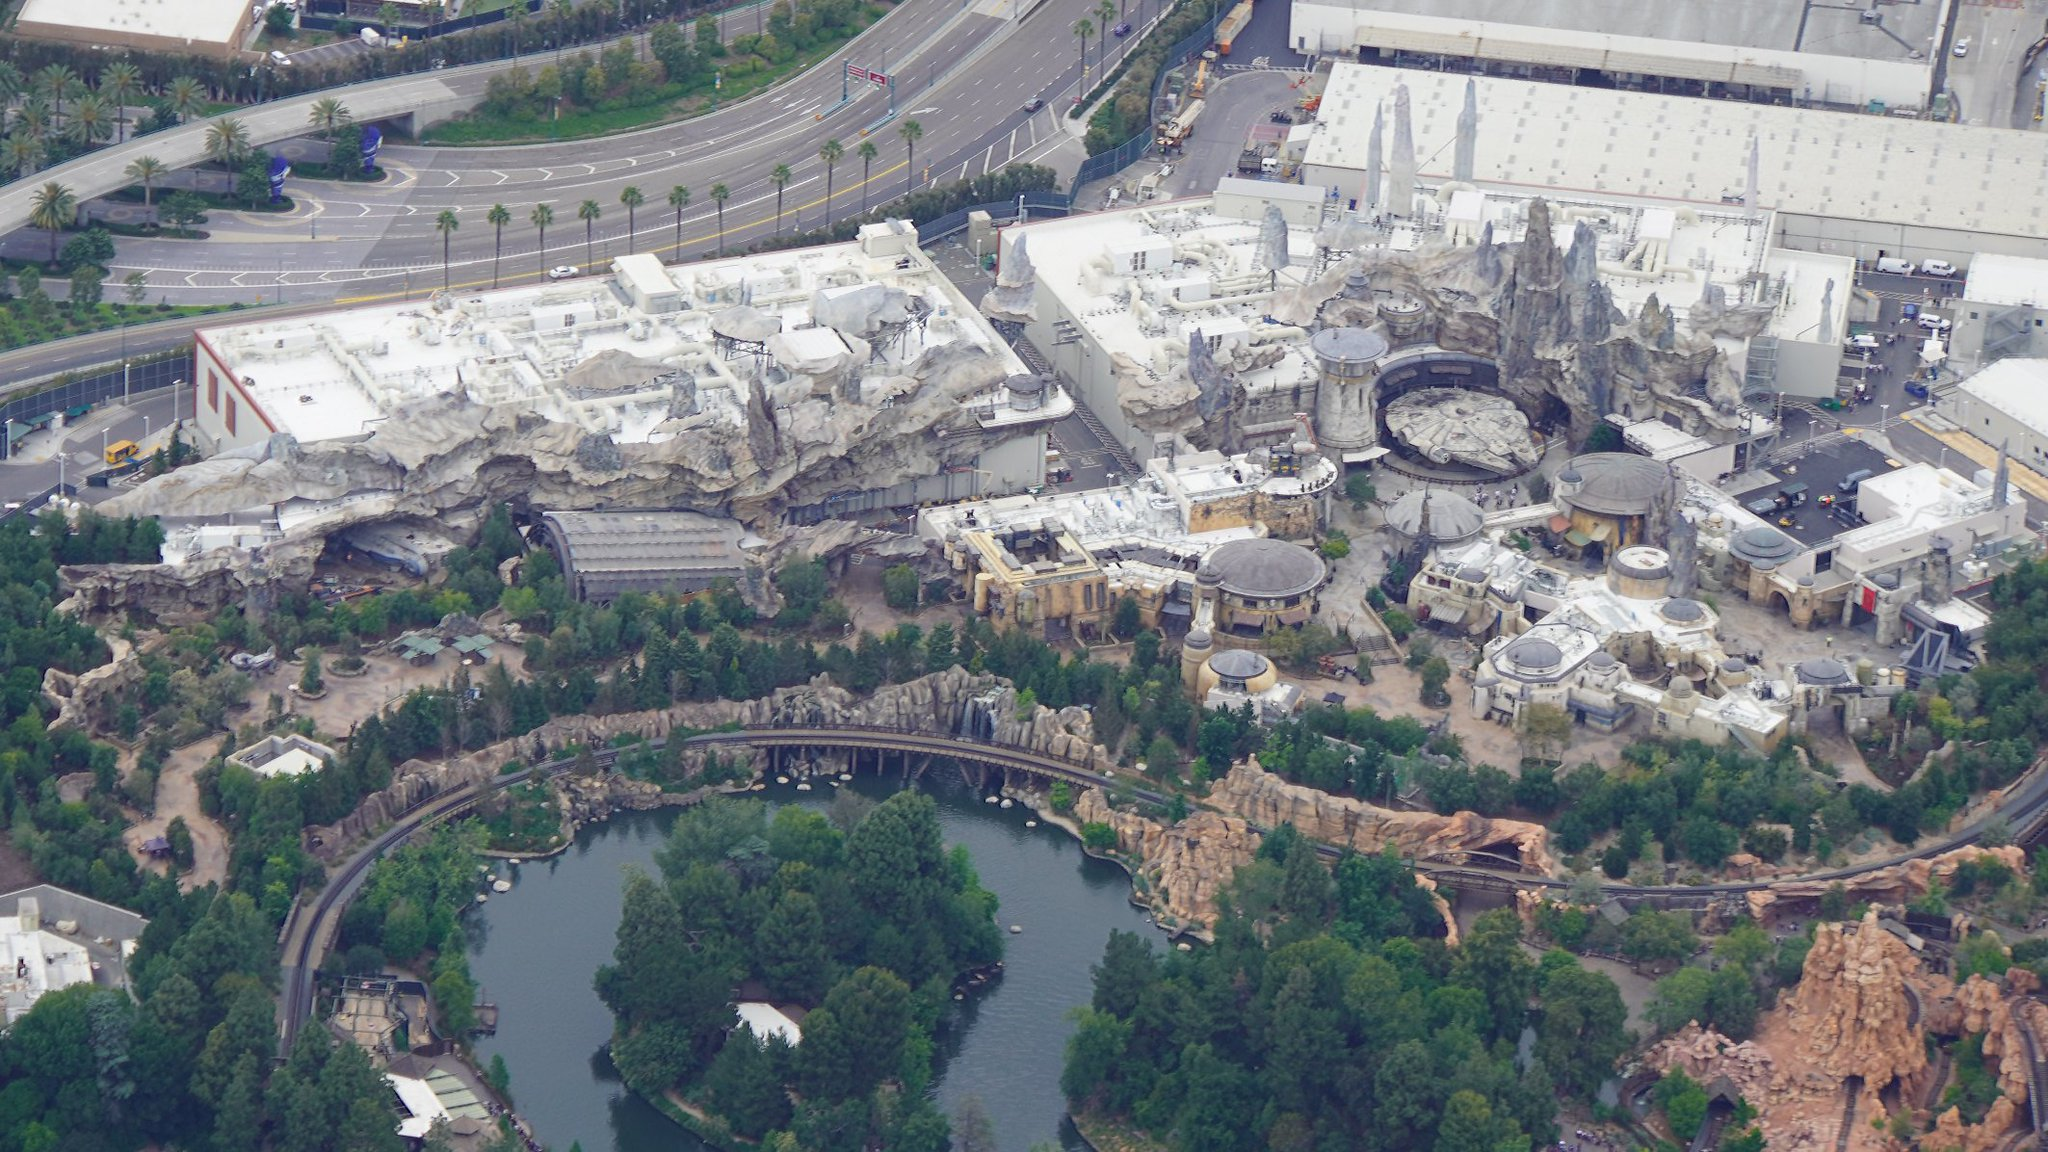 Disneyland Resort vu du ciel, des images sublimes! D6CdDUPUYAApEcF